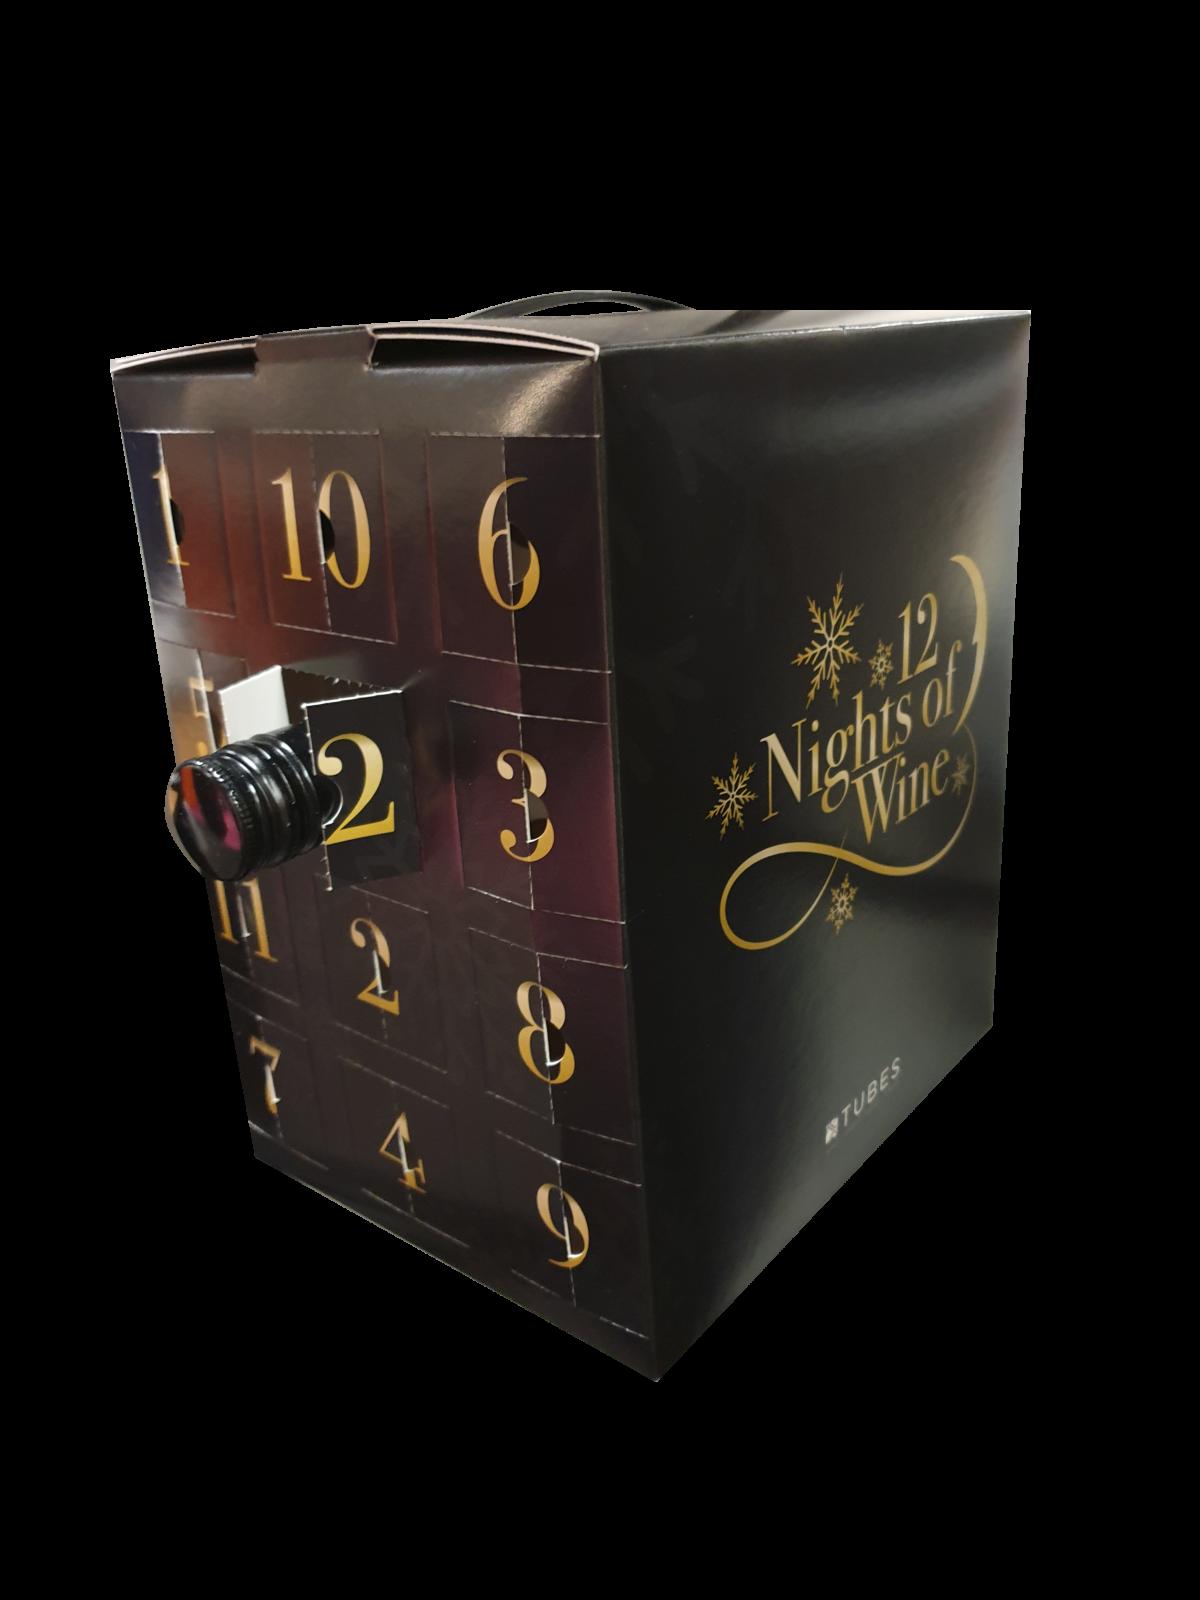 Twelve Nights of Wine - Yipp & Co